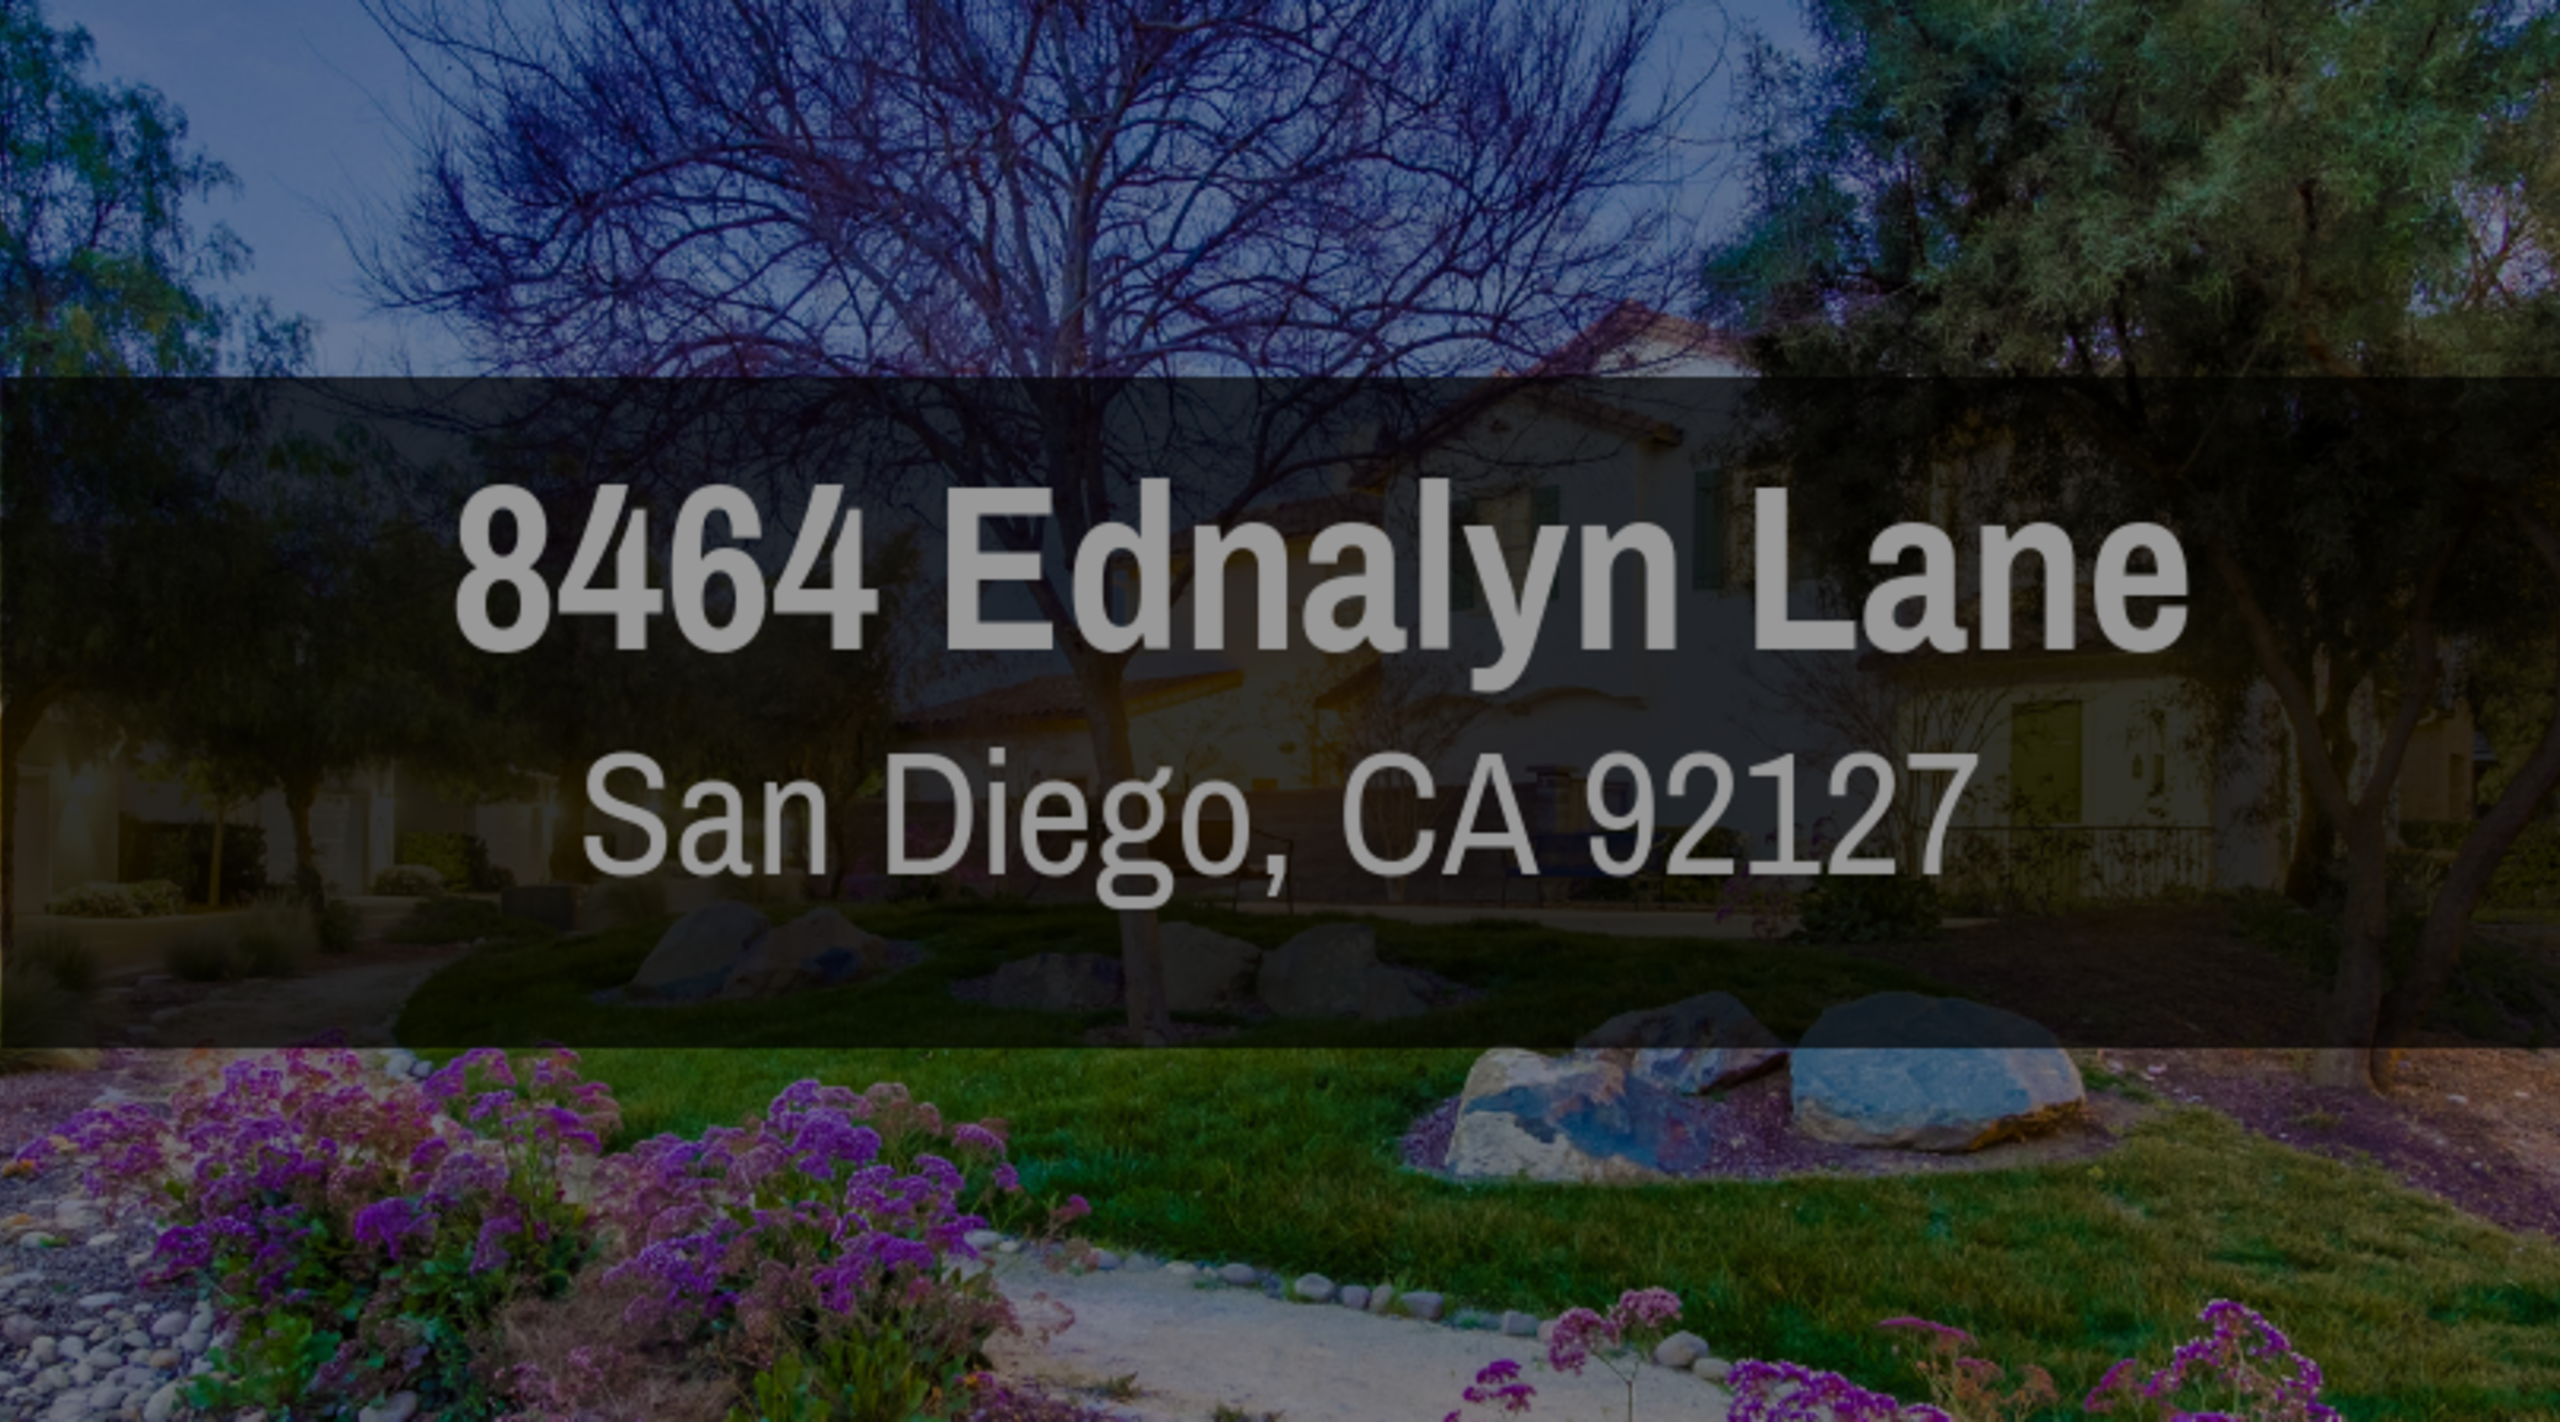 8464 EDNALYN LANE, SAN DIEGO, CA 92127 | FOR SALE